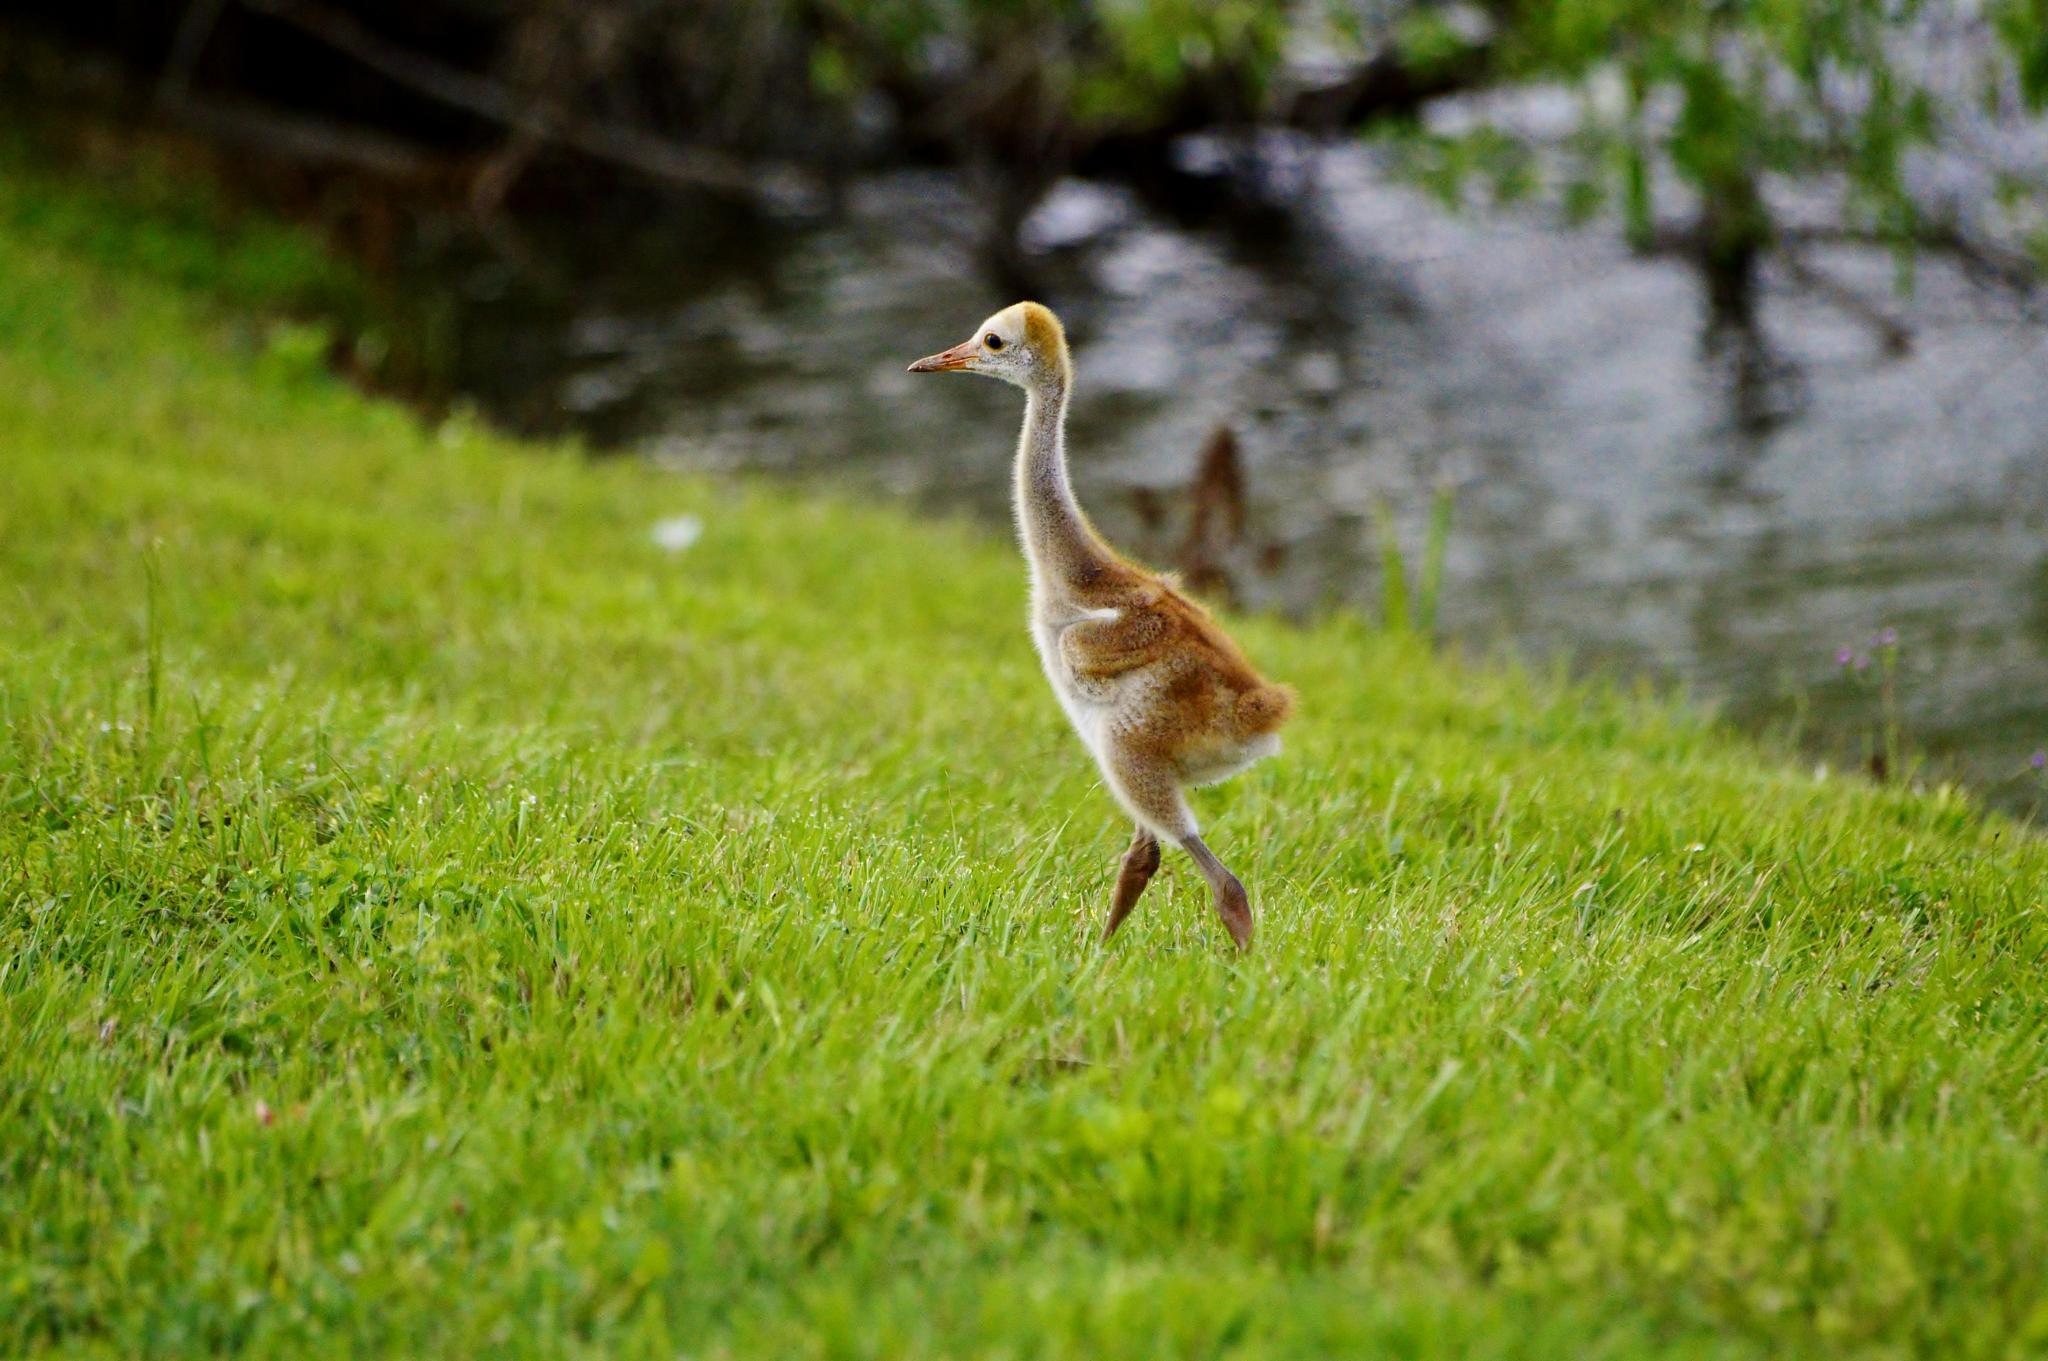 Sand Hill Crane Chick by jamie.dorton